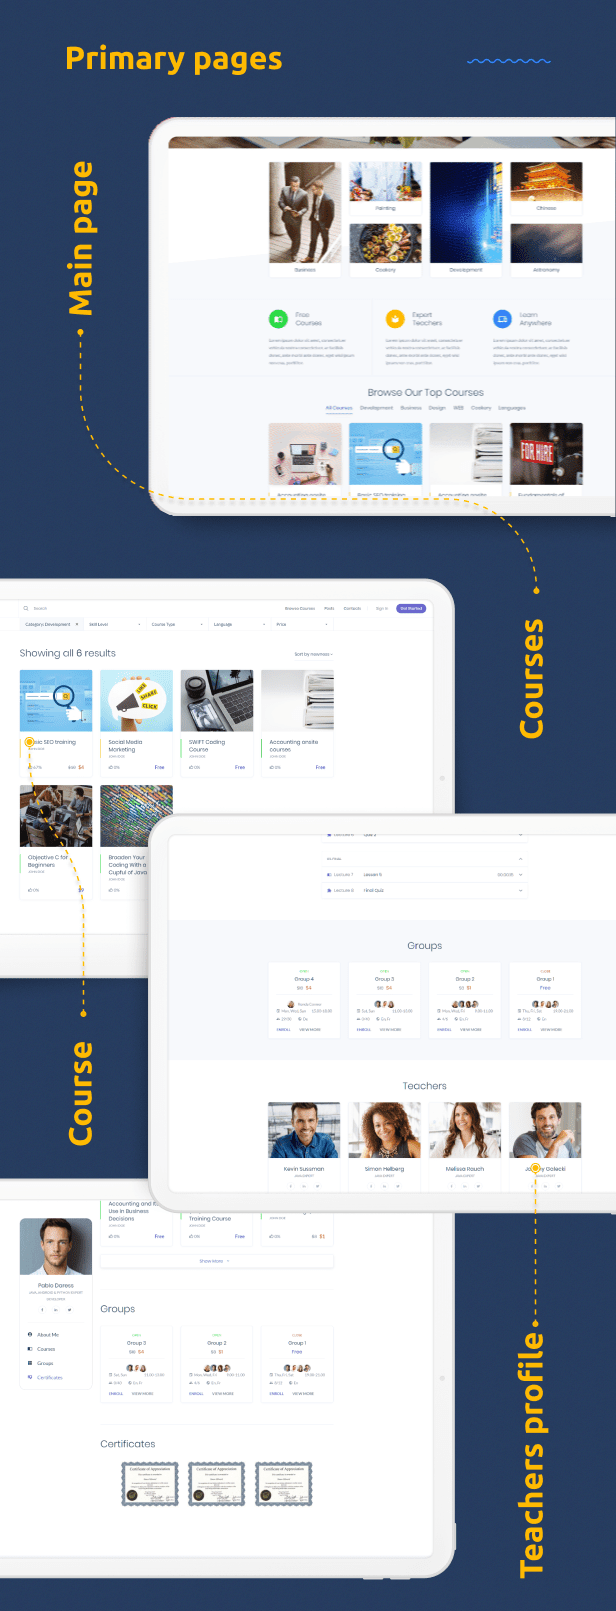 Intellekt - Bildung WordPress Theme - 3